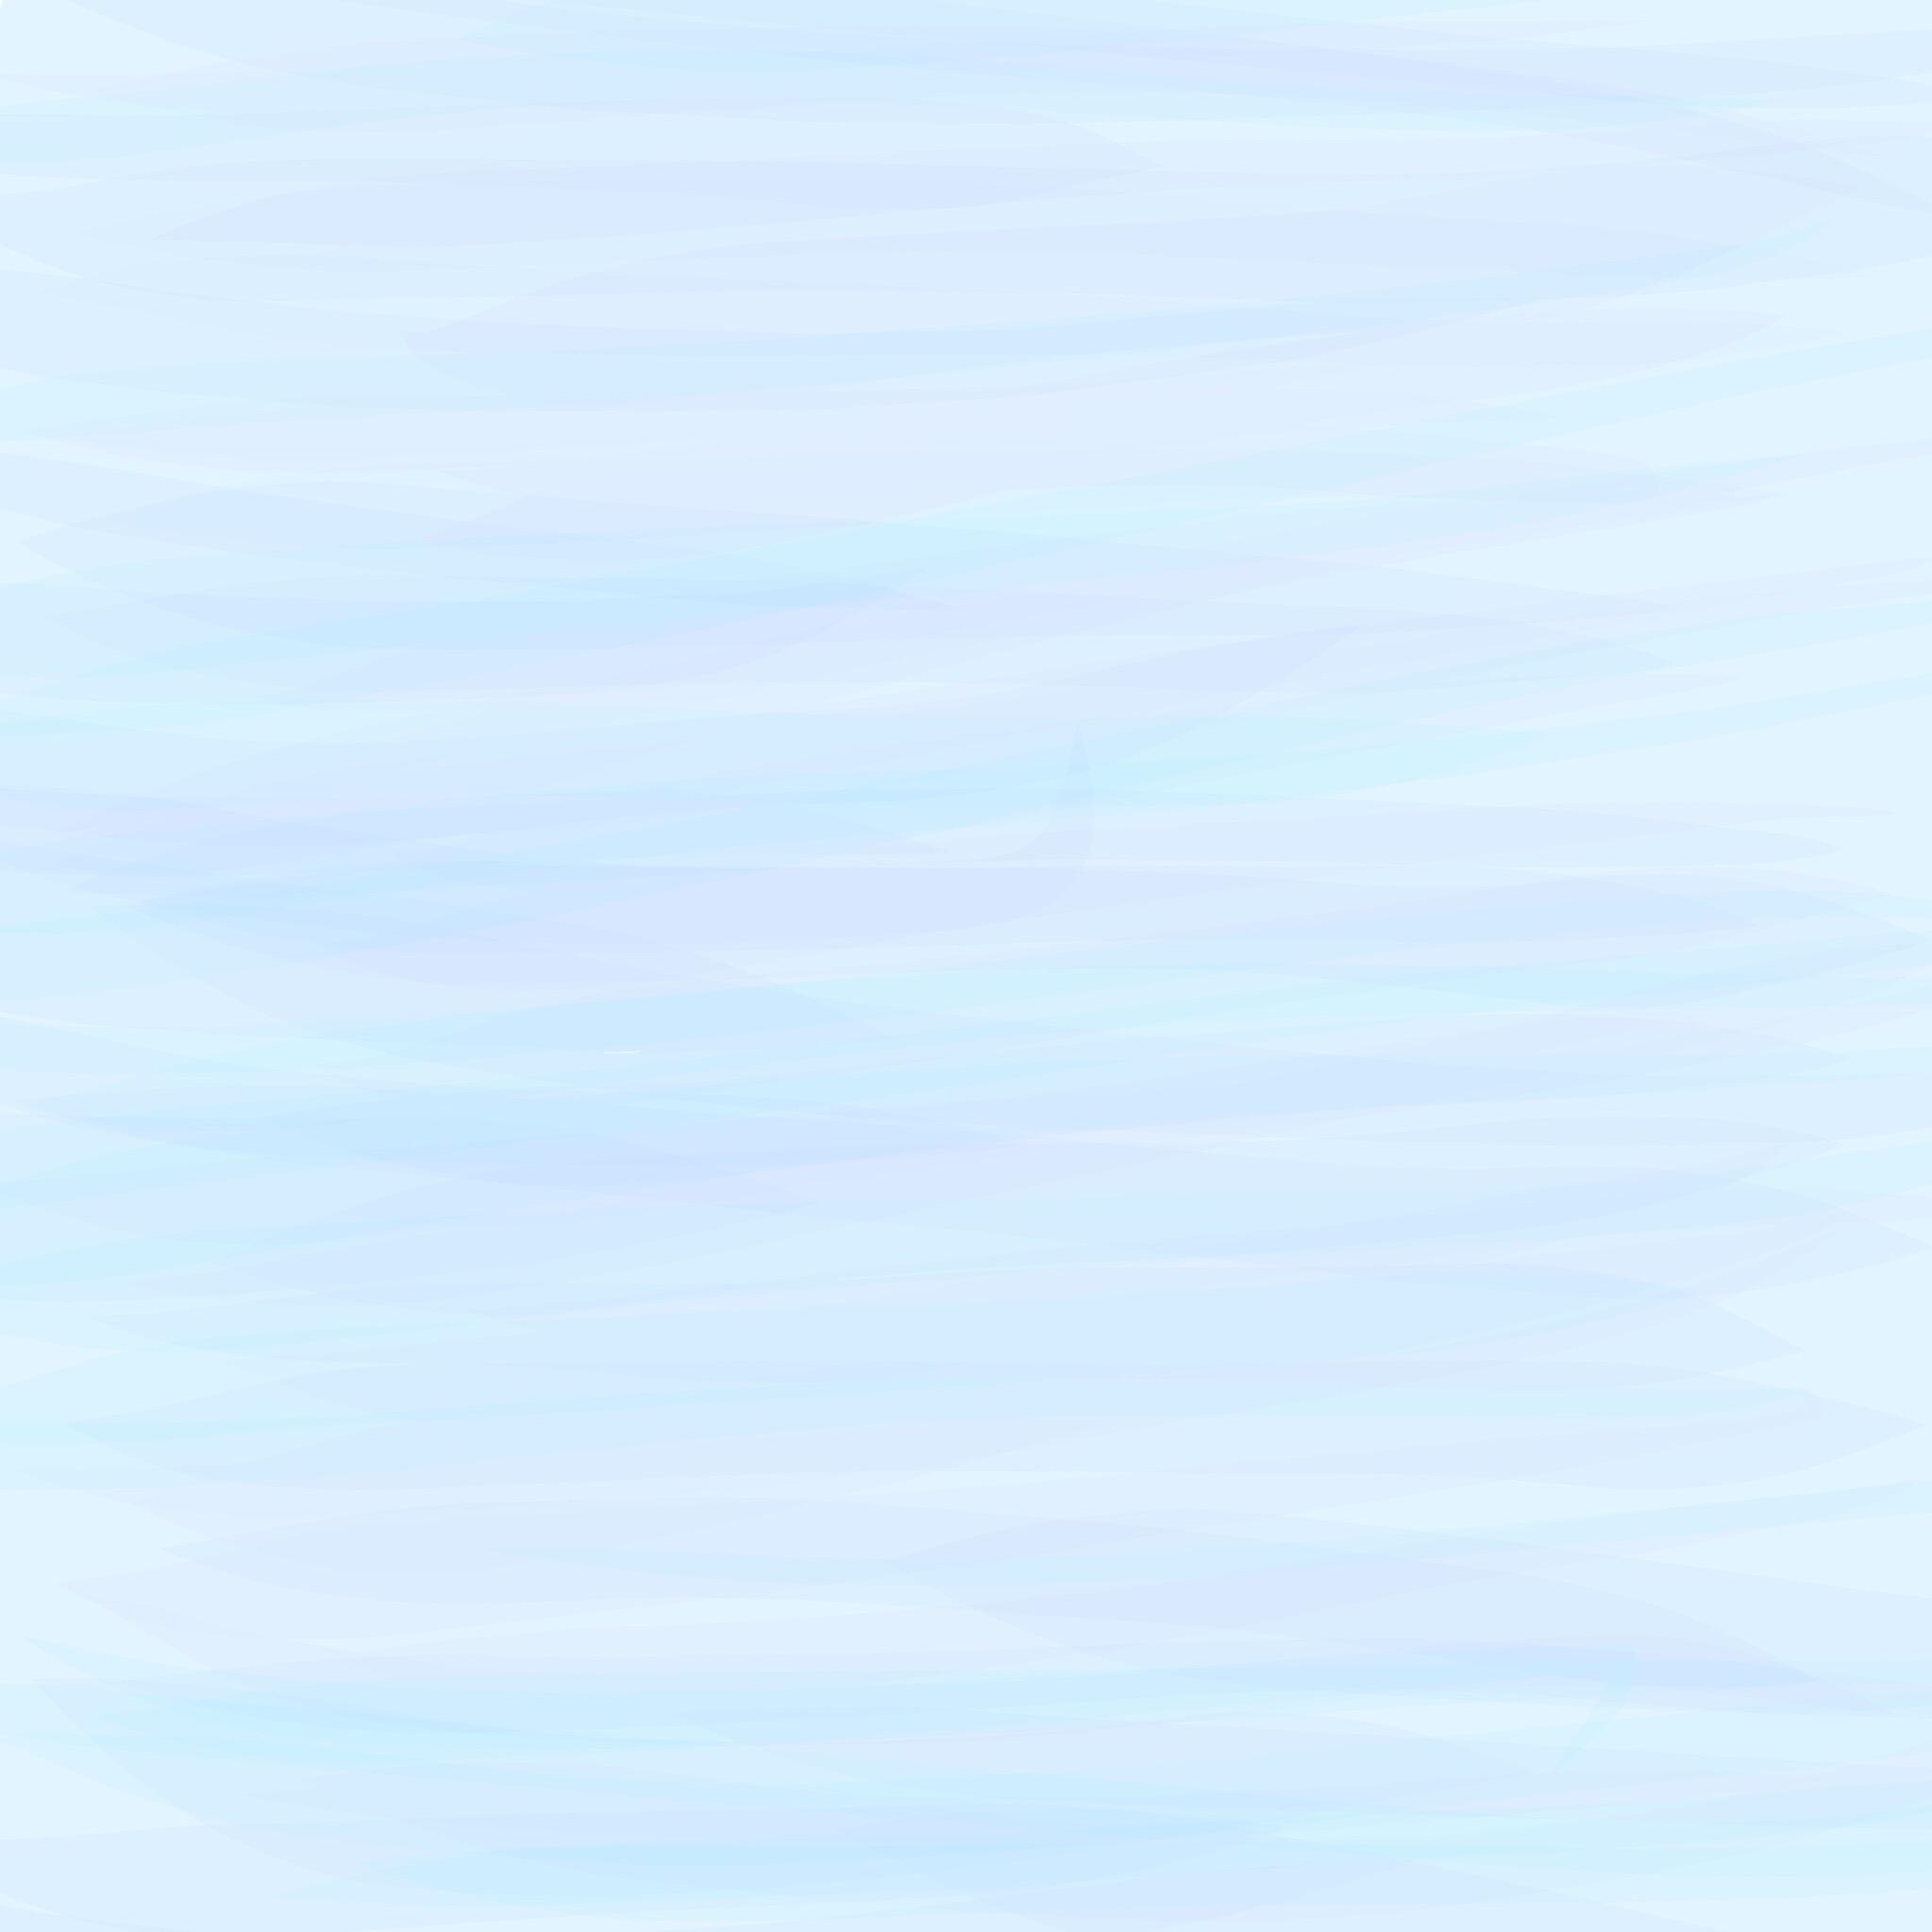 #blue #bluebackground #blue_background #pastelblue #lightbluebackground #bluegradient #gradientbackground #bluegradient #freetoedit